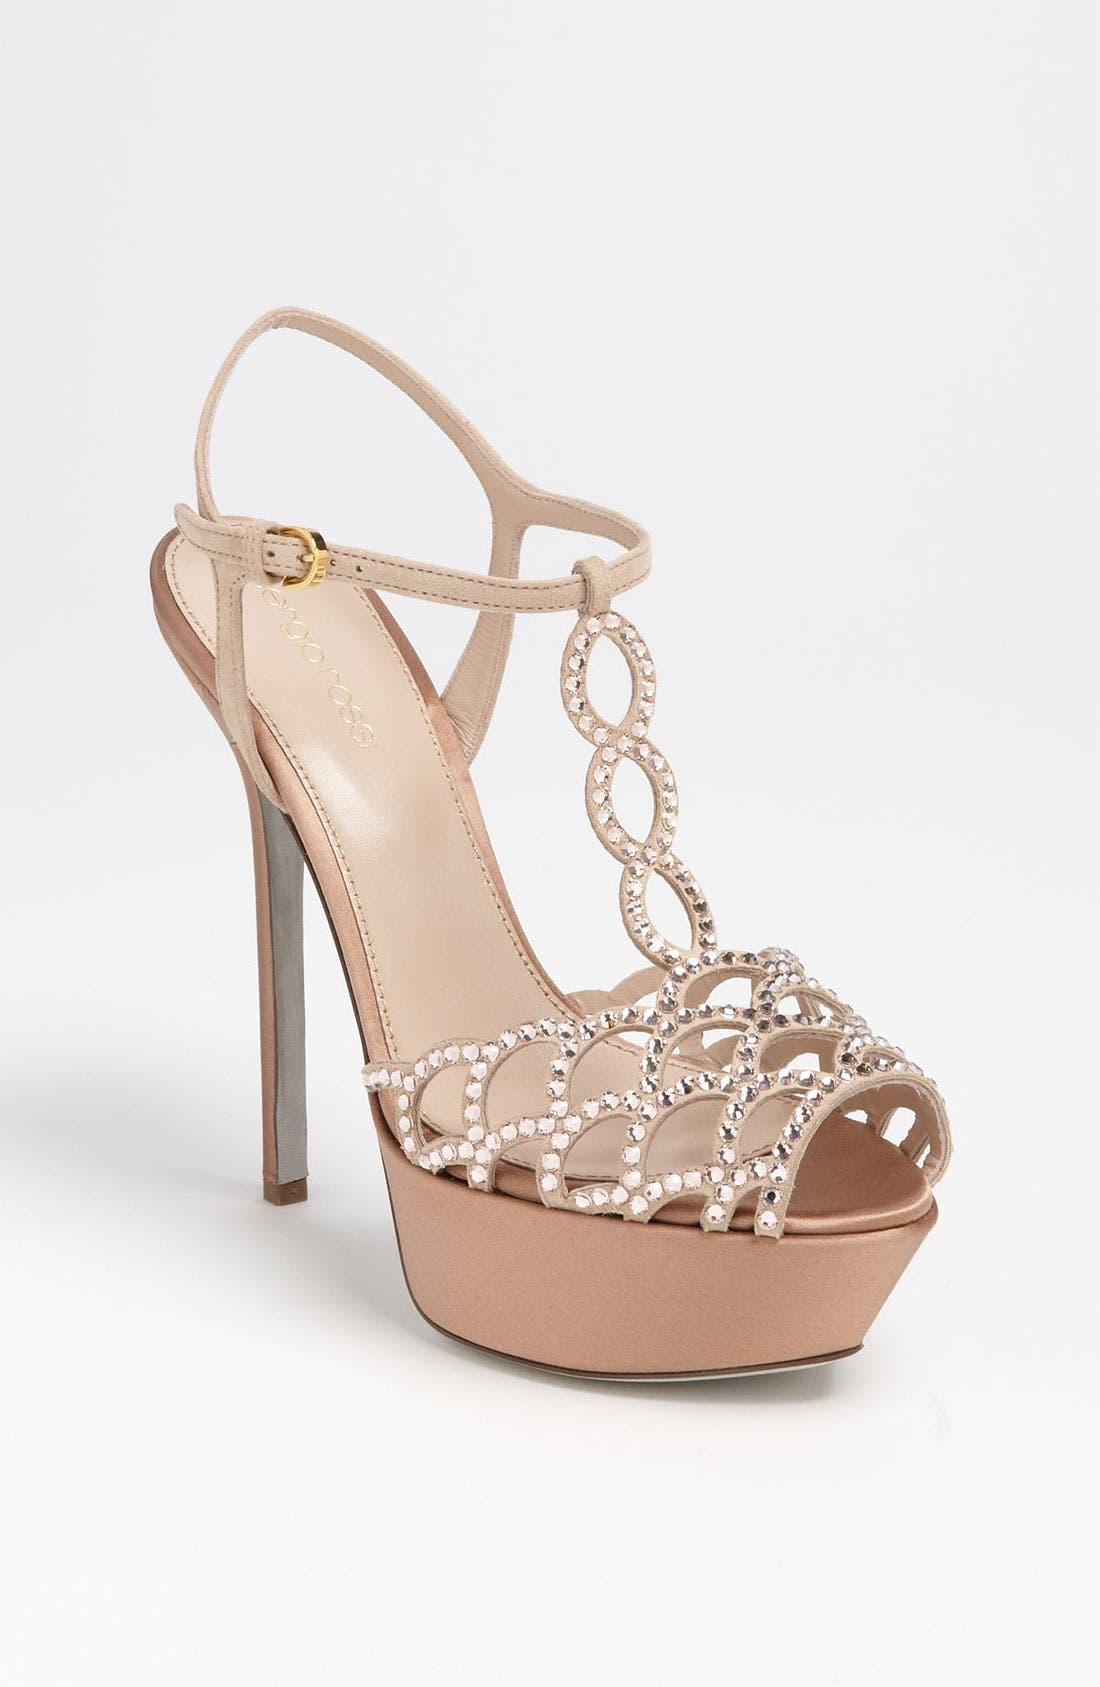 Main Image - Sergio Rossi 'Crystal Vague' Platform Sandal